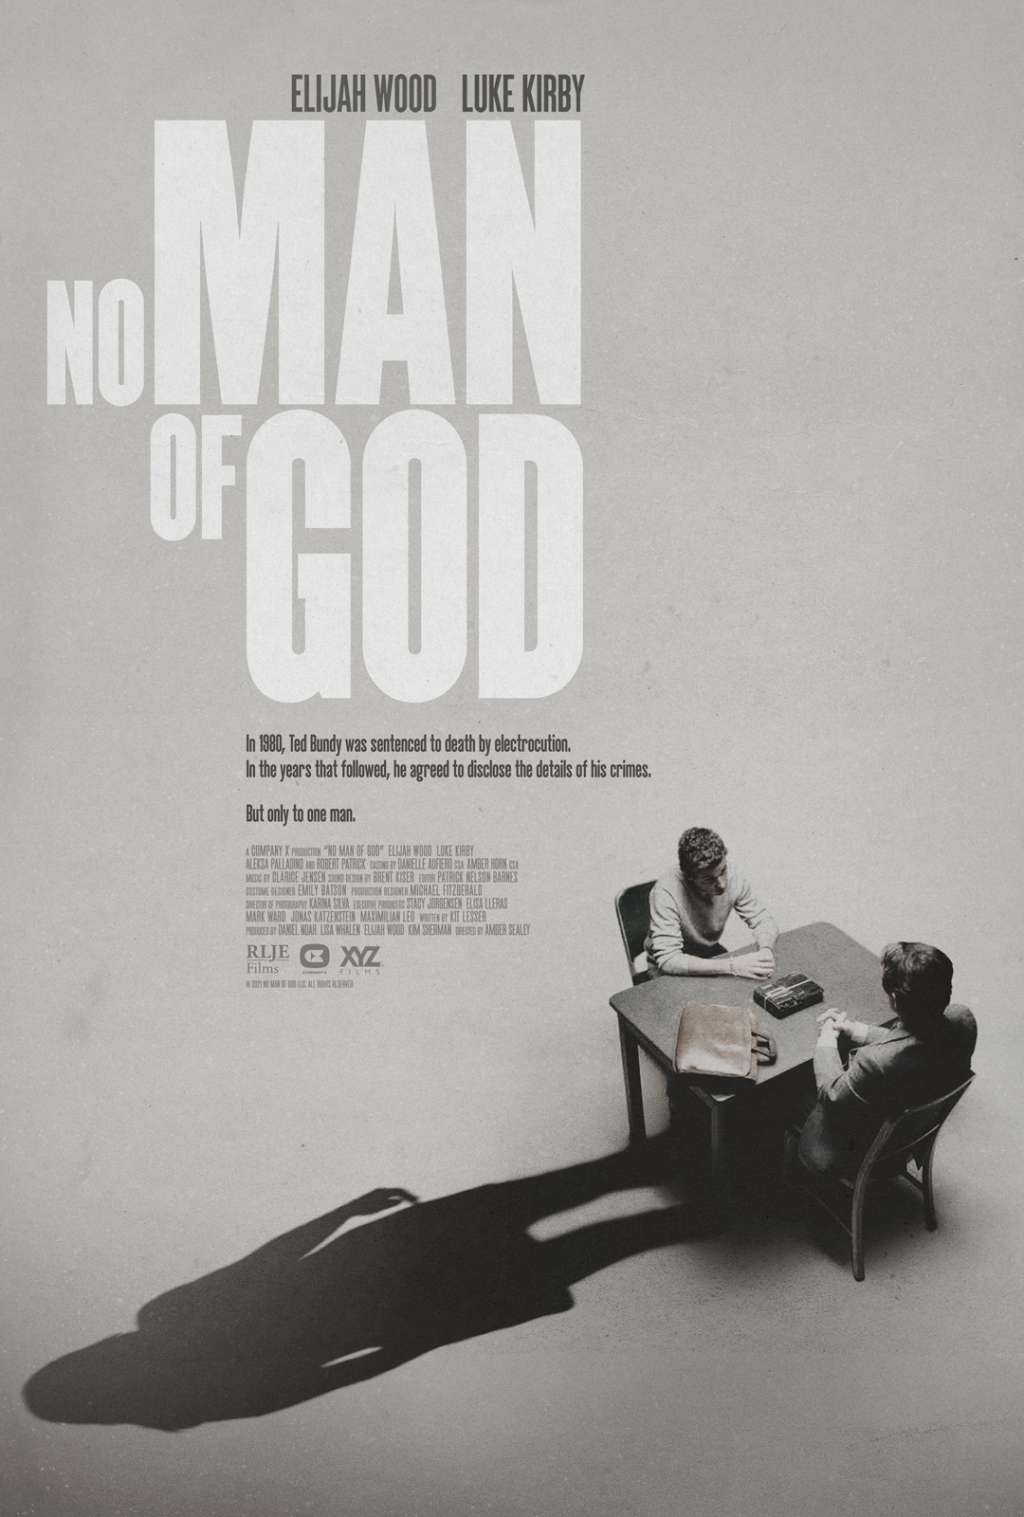 No Man of God kapak